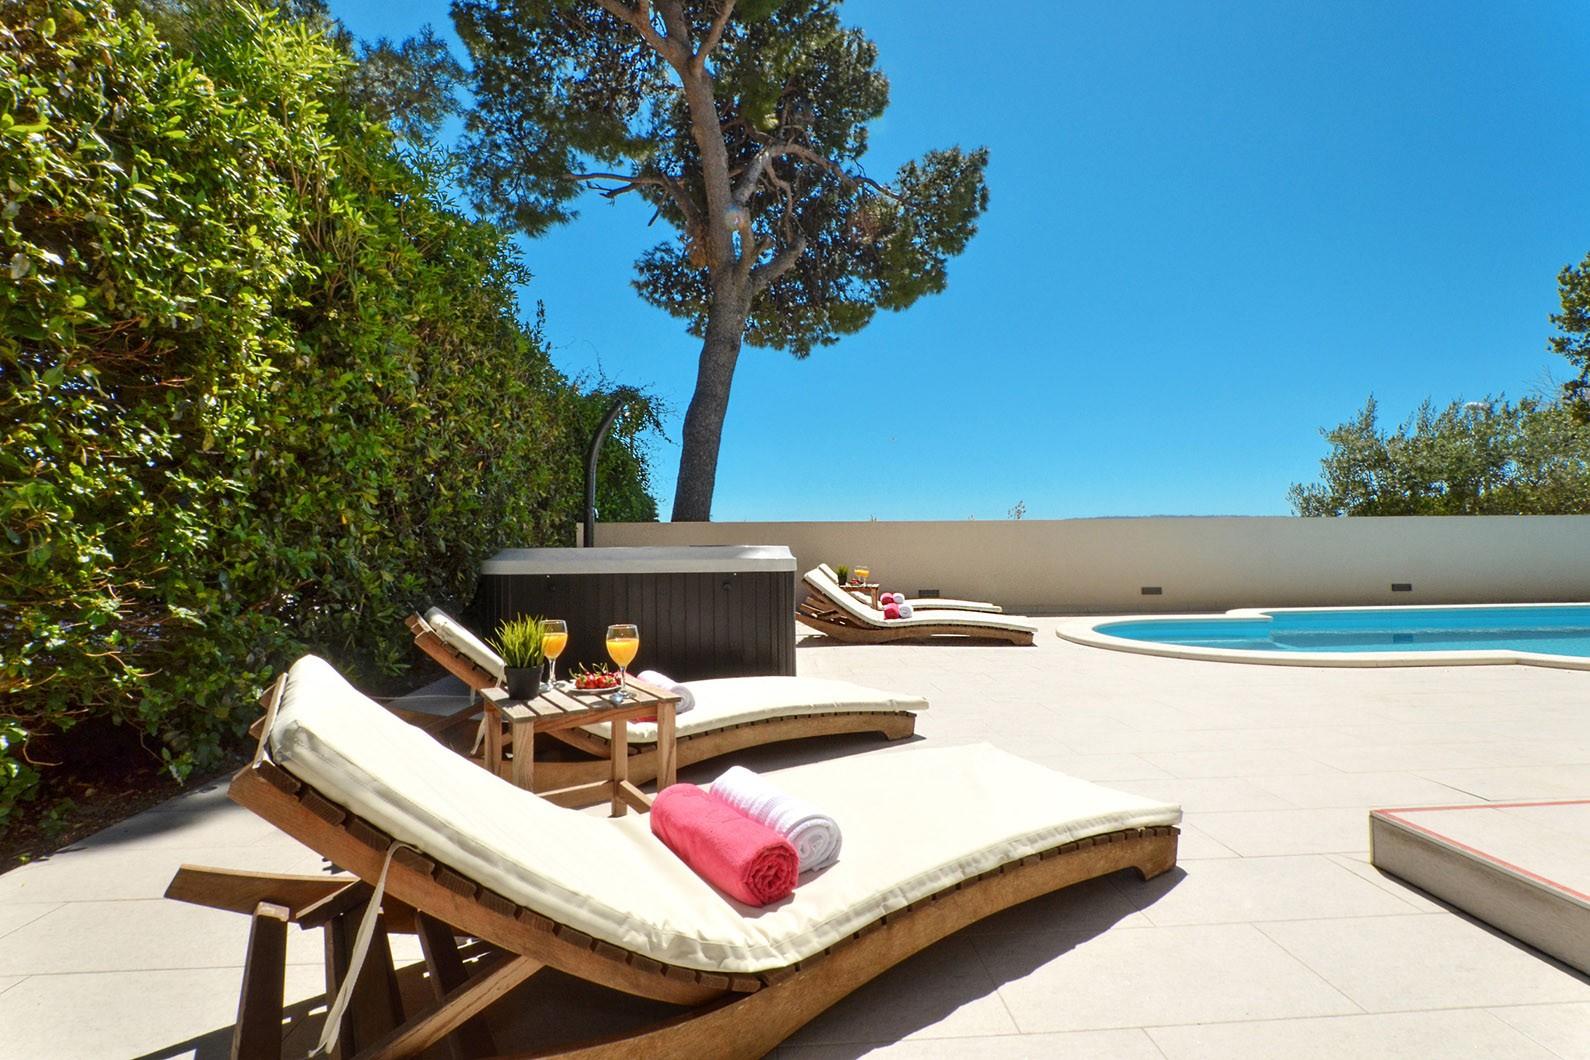 Luxury Apartment near Split, Vacation Rental Croatia